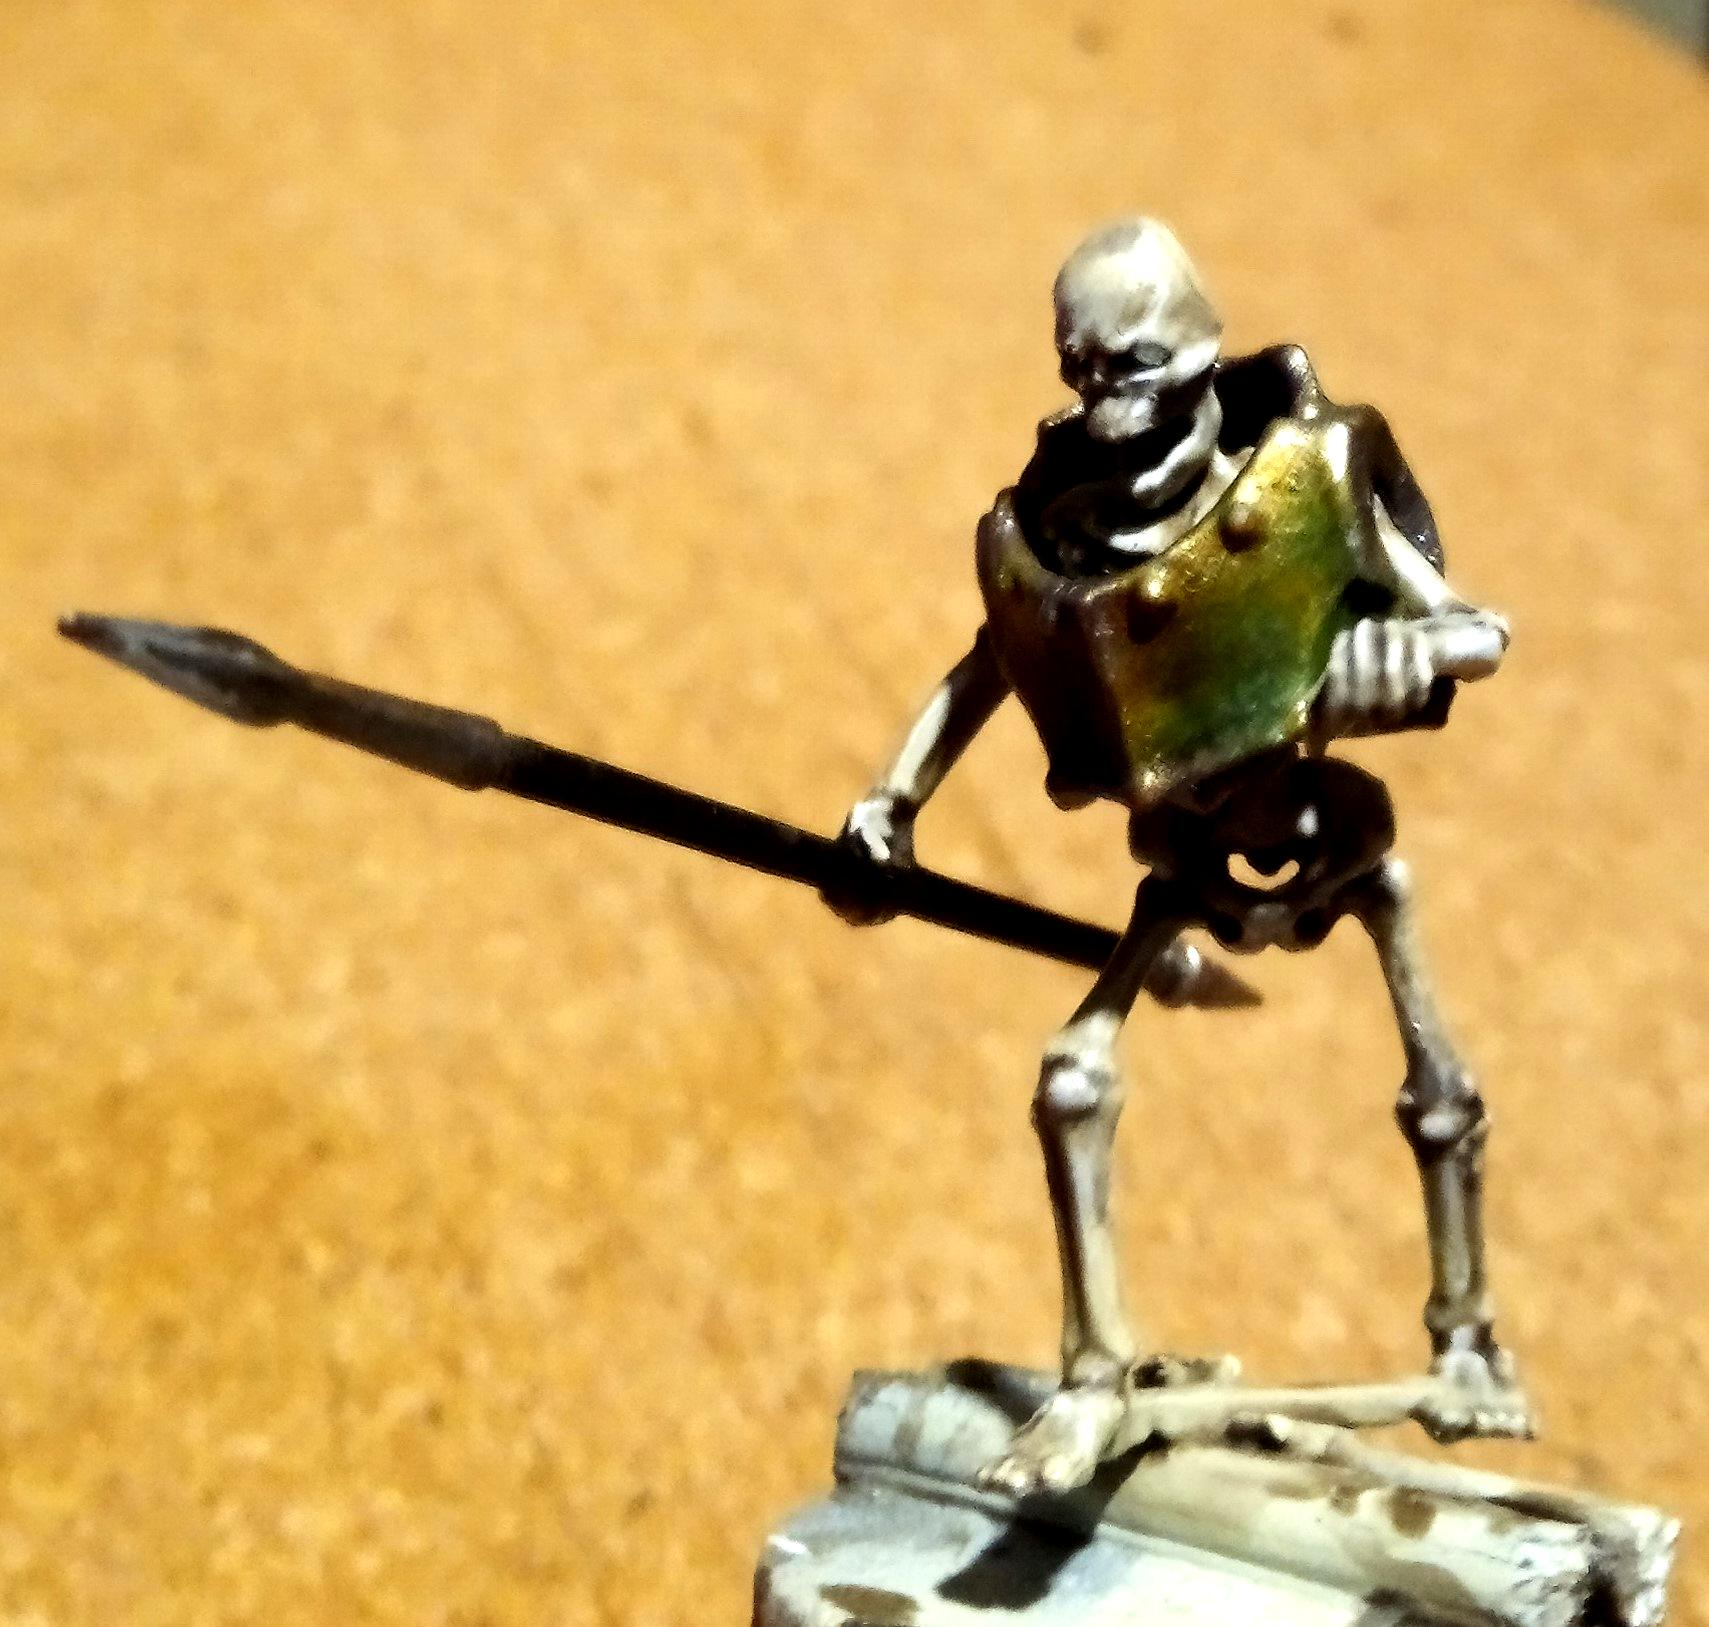 Conversion, Skeletal, Skeletons, Undead, Wargame Exclusive, Warlords Of Erehwon